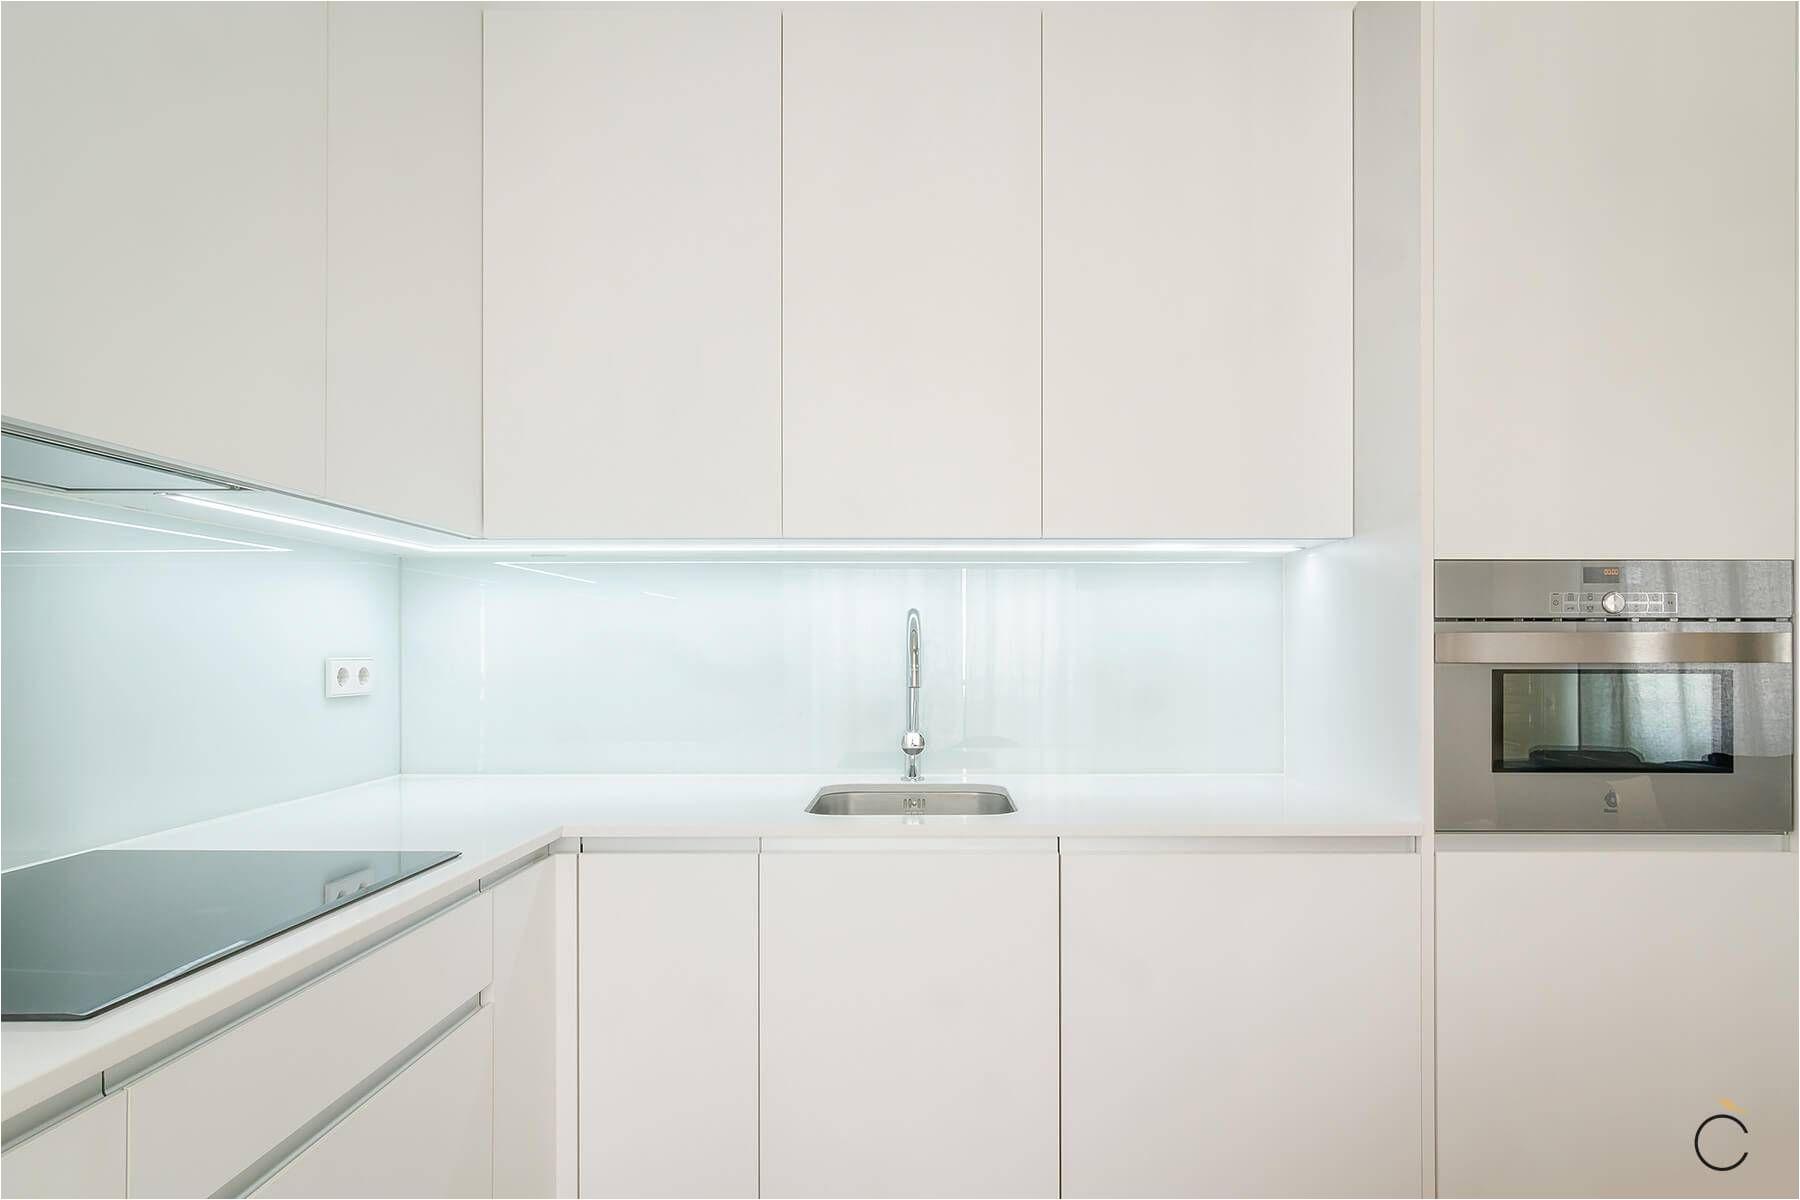 amueblar cocinas pequea as a nico fotos el mas eficaz coleccia n disea os de cocinas pequea as informacia n